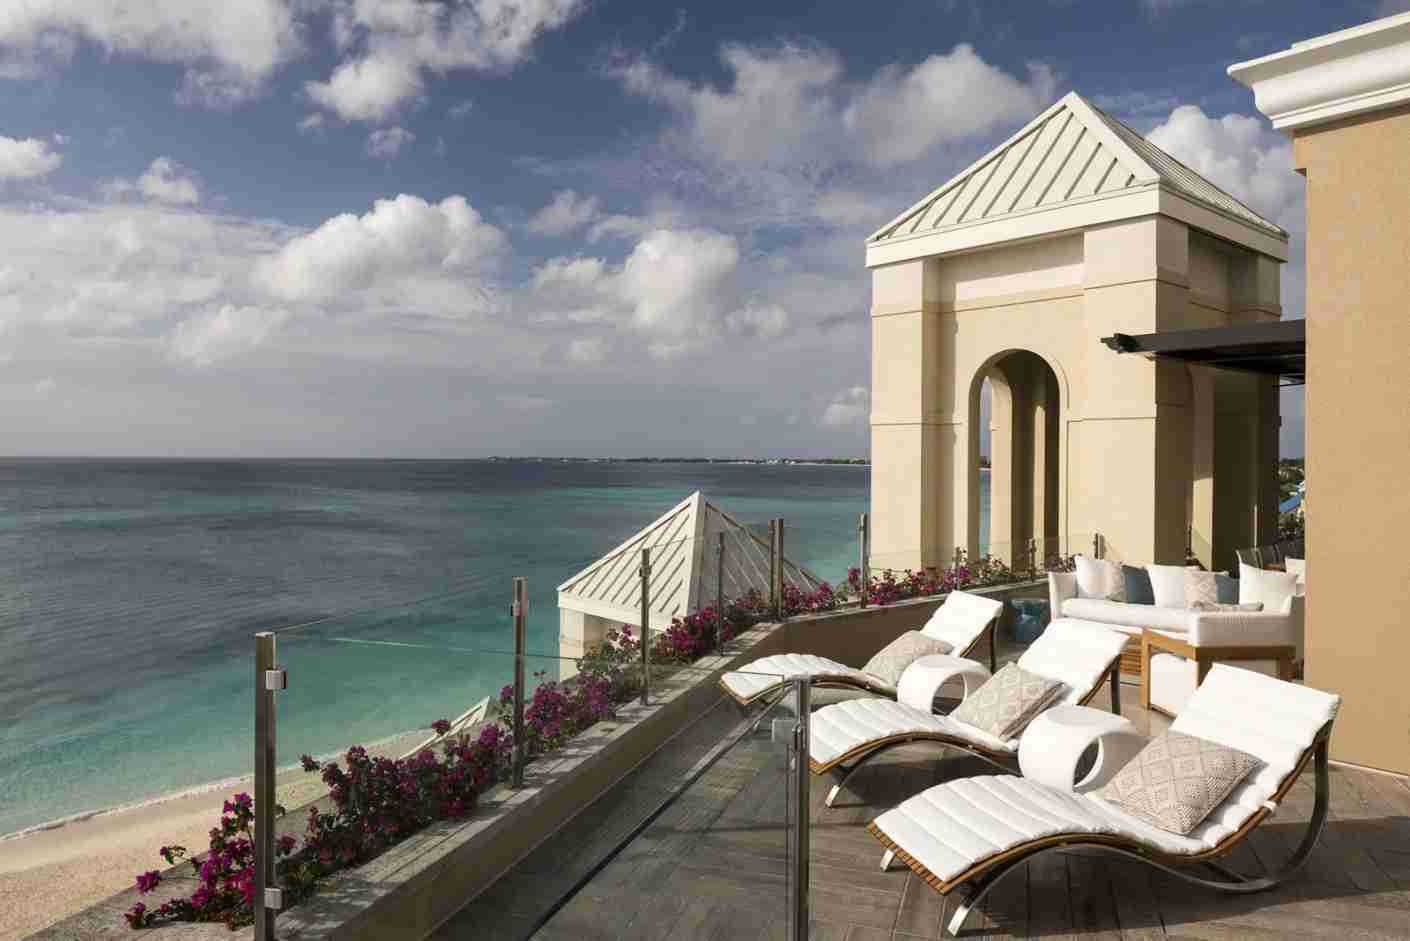 The Ritz-Carlton Grand Cayman. (Photo courtesy of Ritz-Carlton)